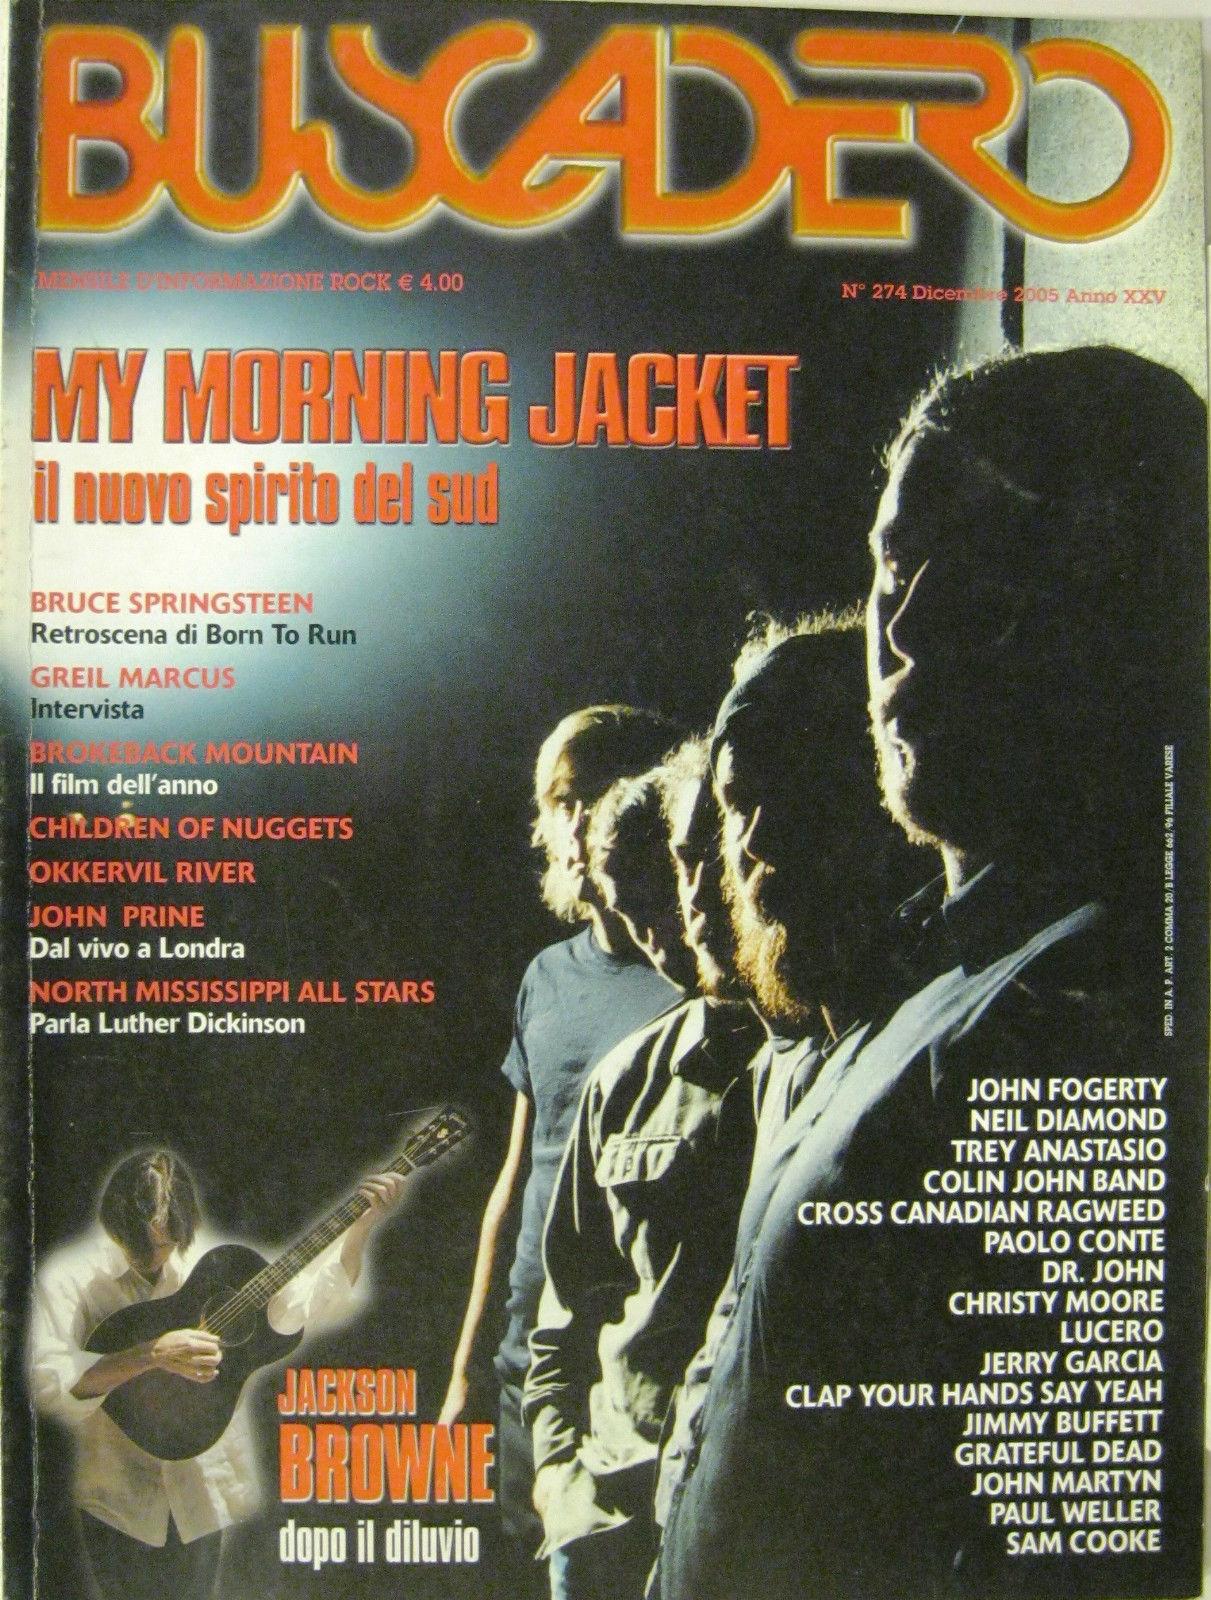 Buscadero n. 274 (dicembre 2005)